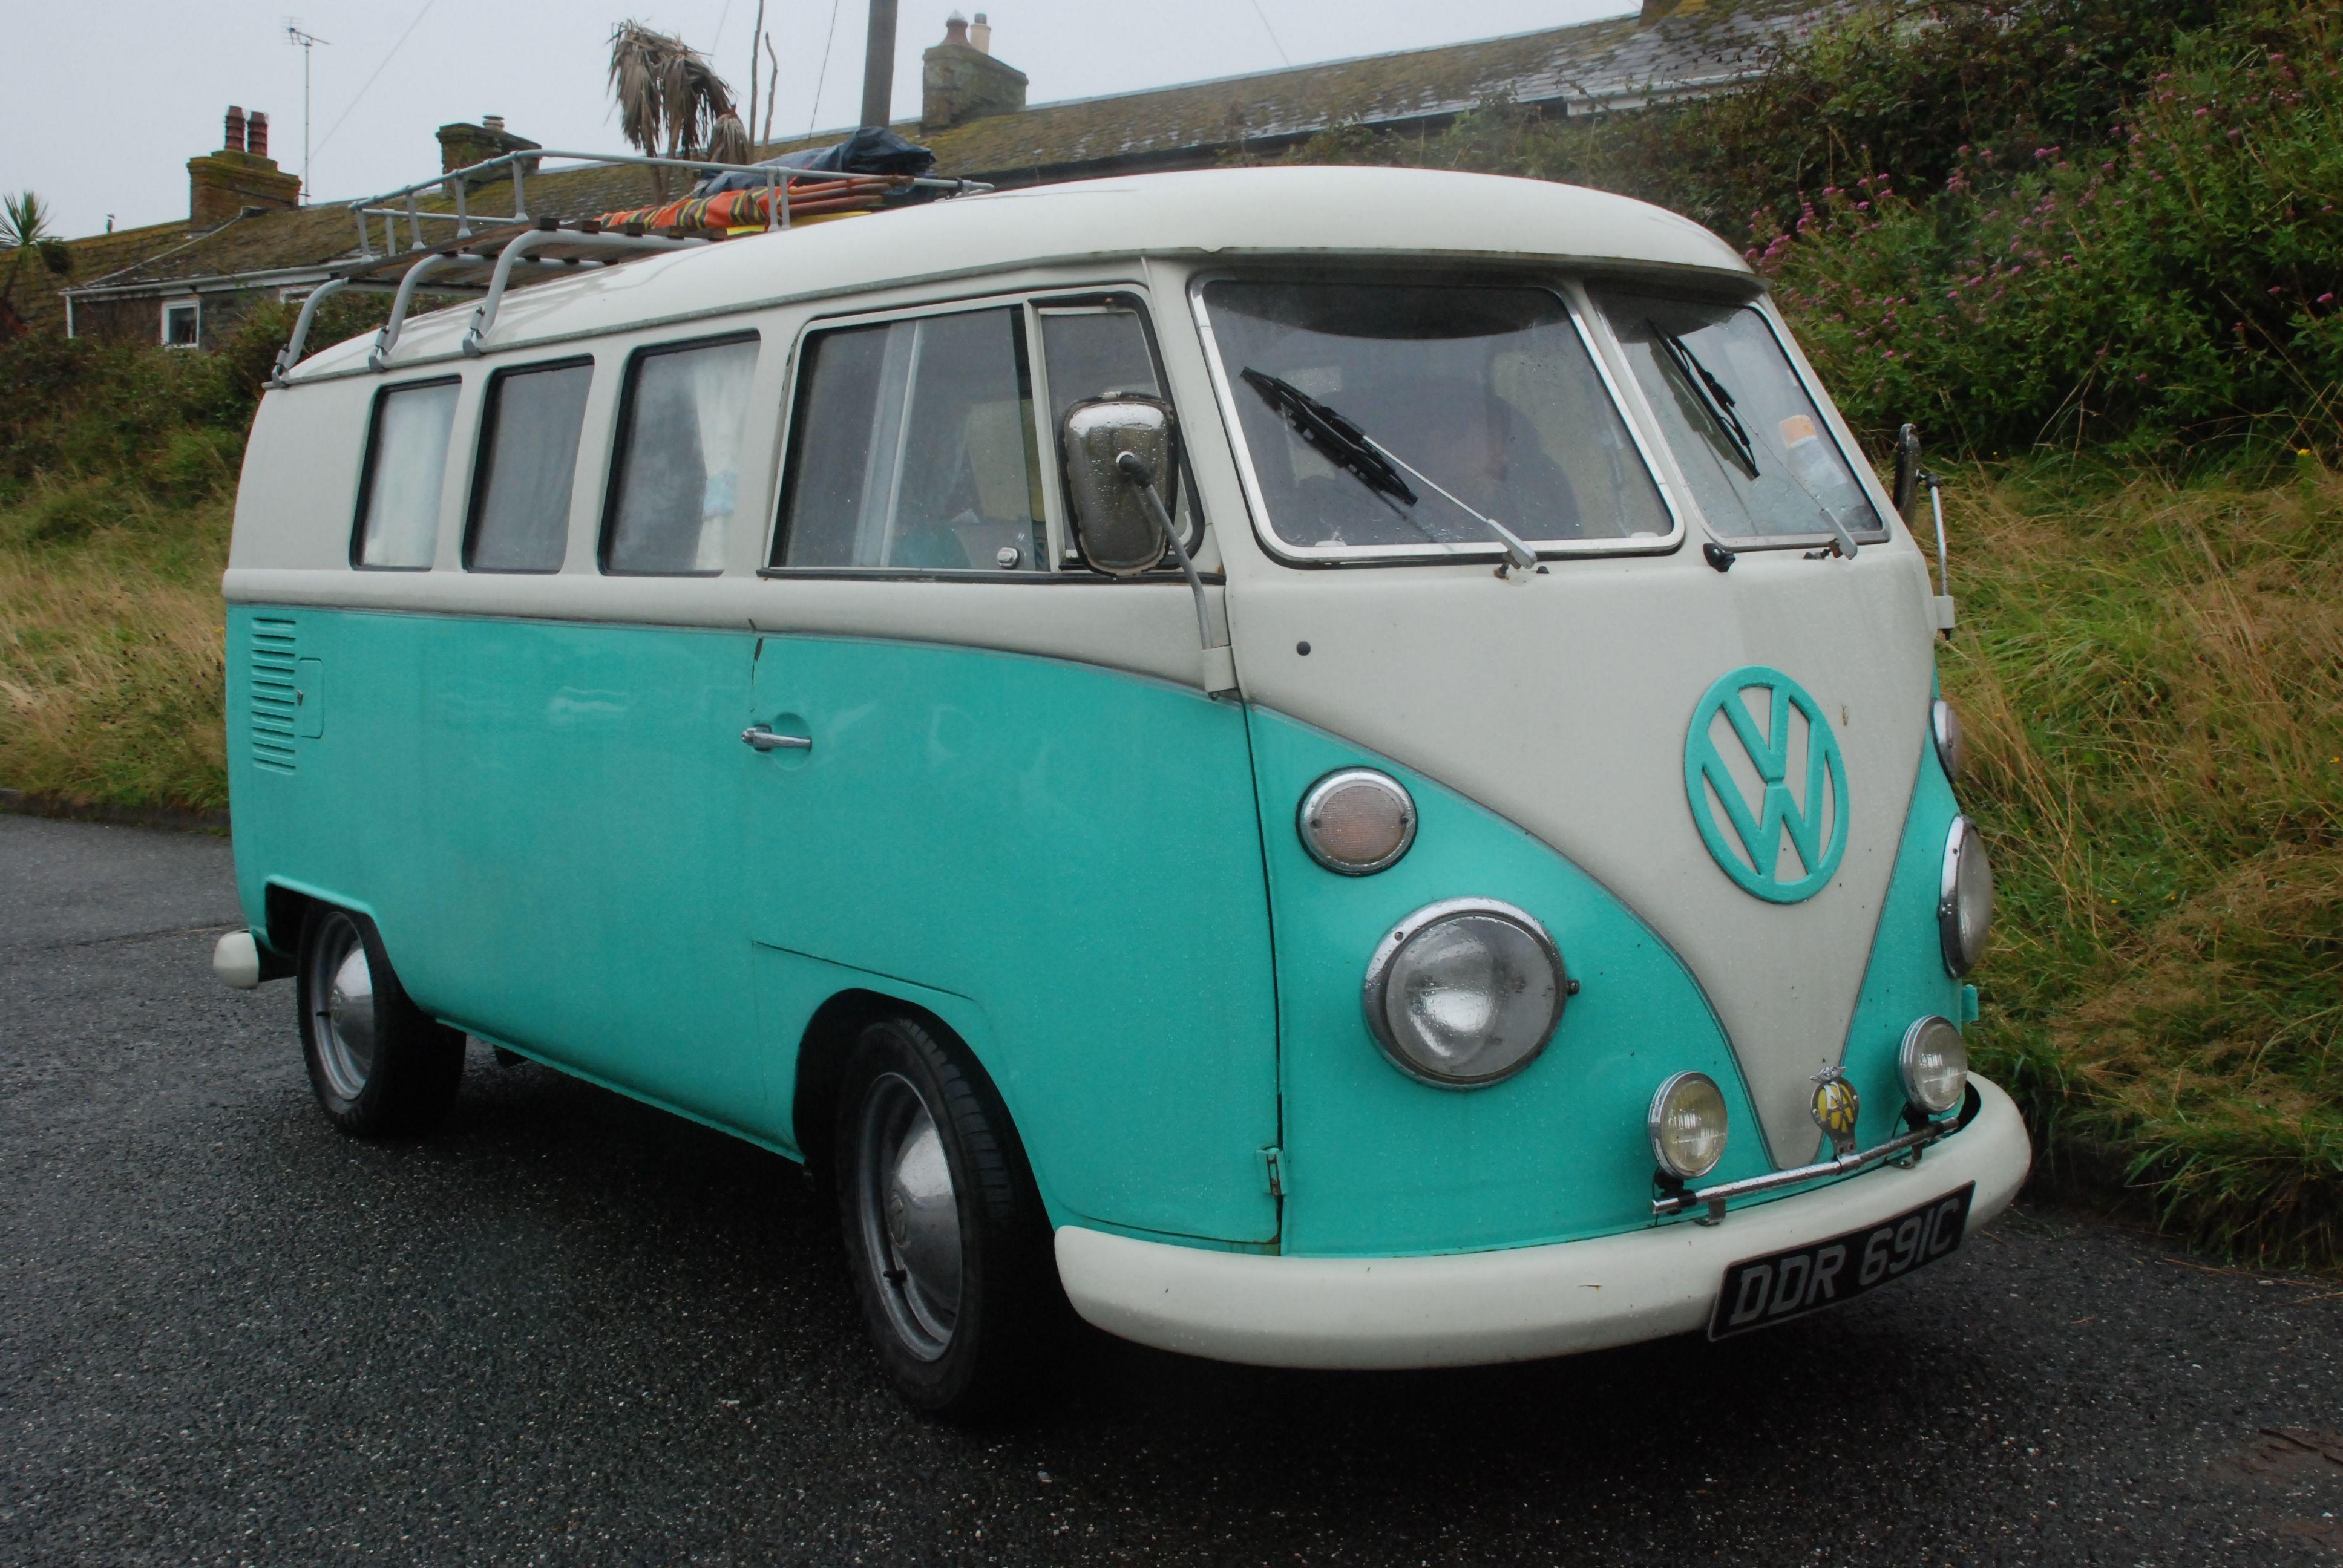 lowrider volkswagen pin camper tuning lowriders bus classic vw wallpaper